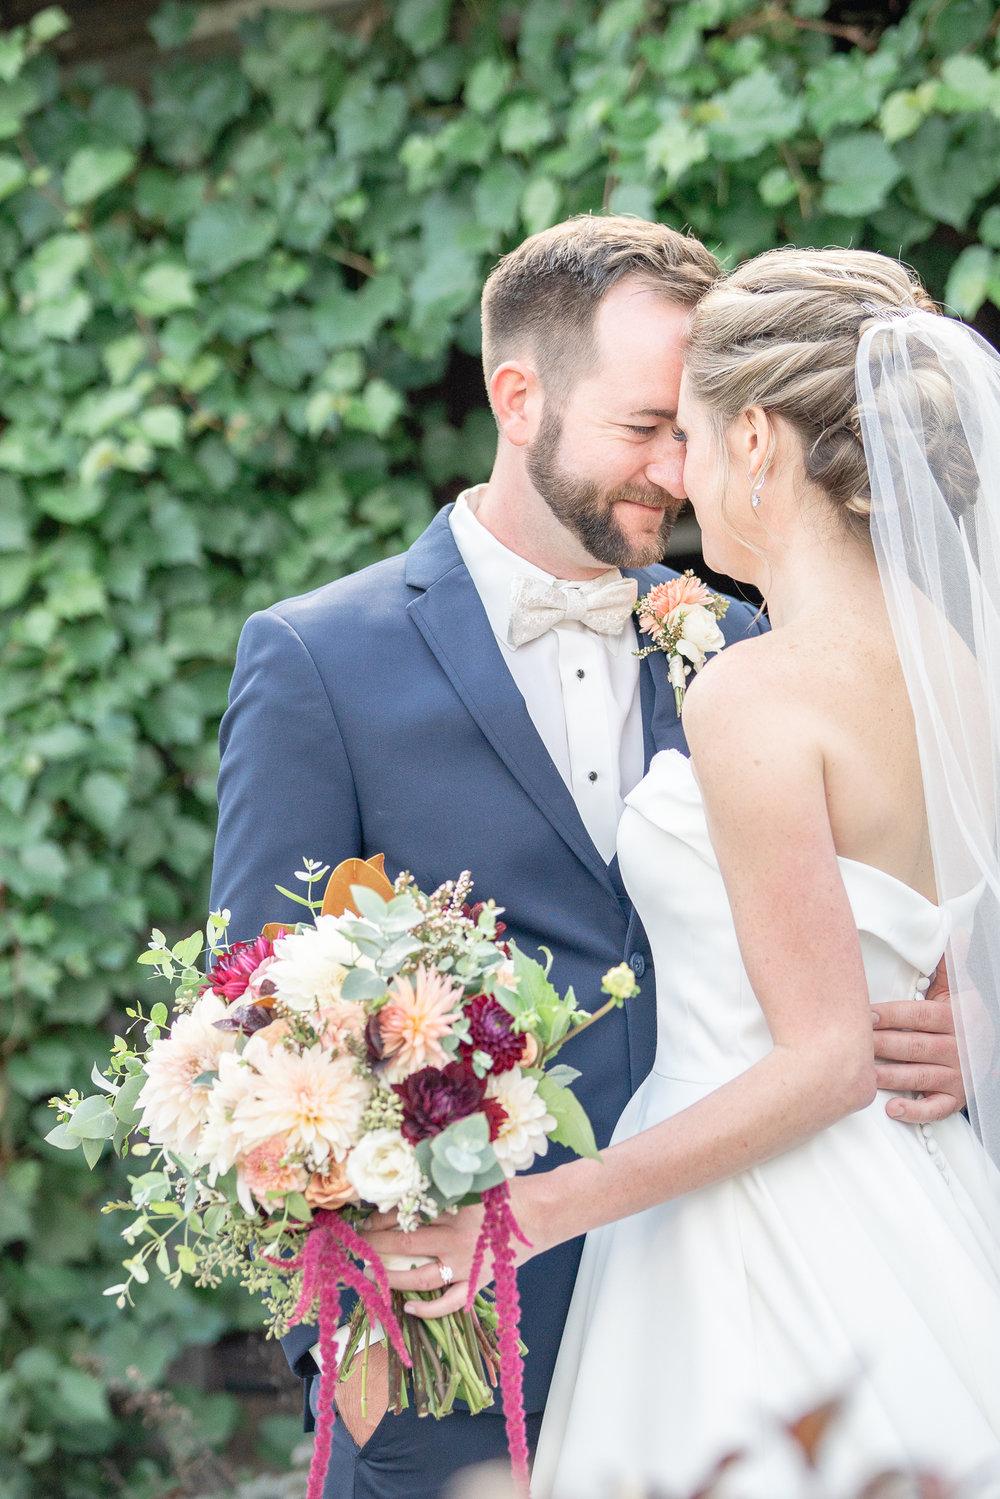 09_28_2018_Dana_Slifer_Photography_Kaitlin_and_Matthew_Wedding_WEB_111.jpg